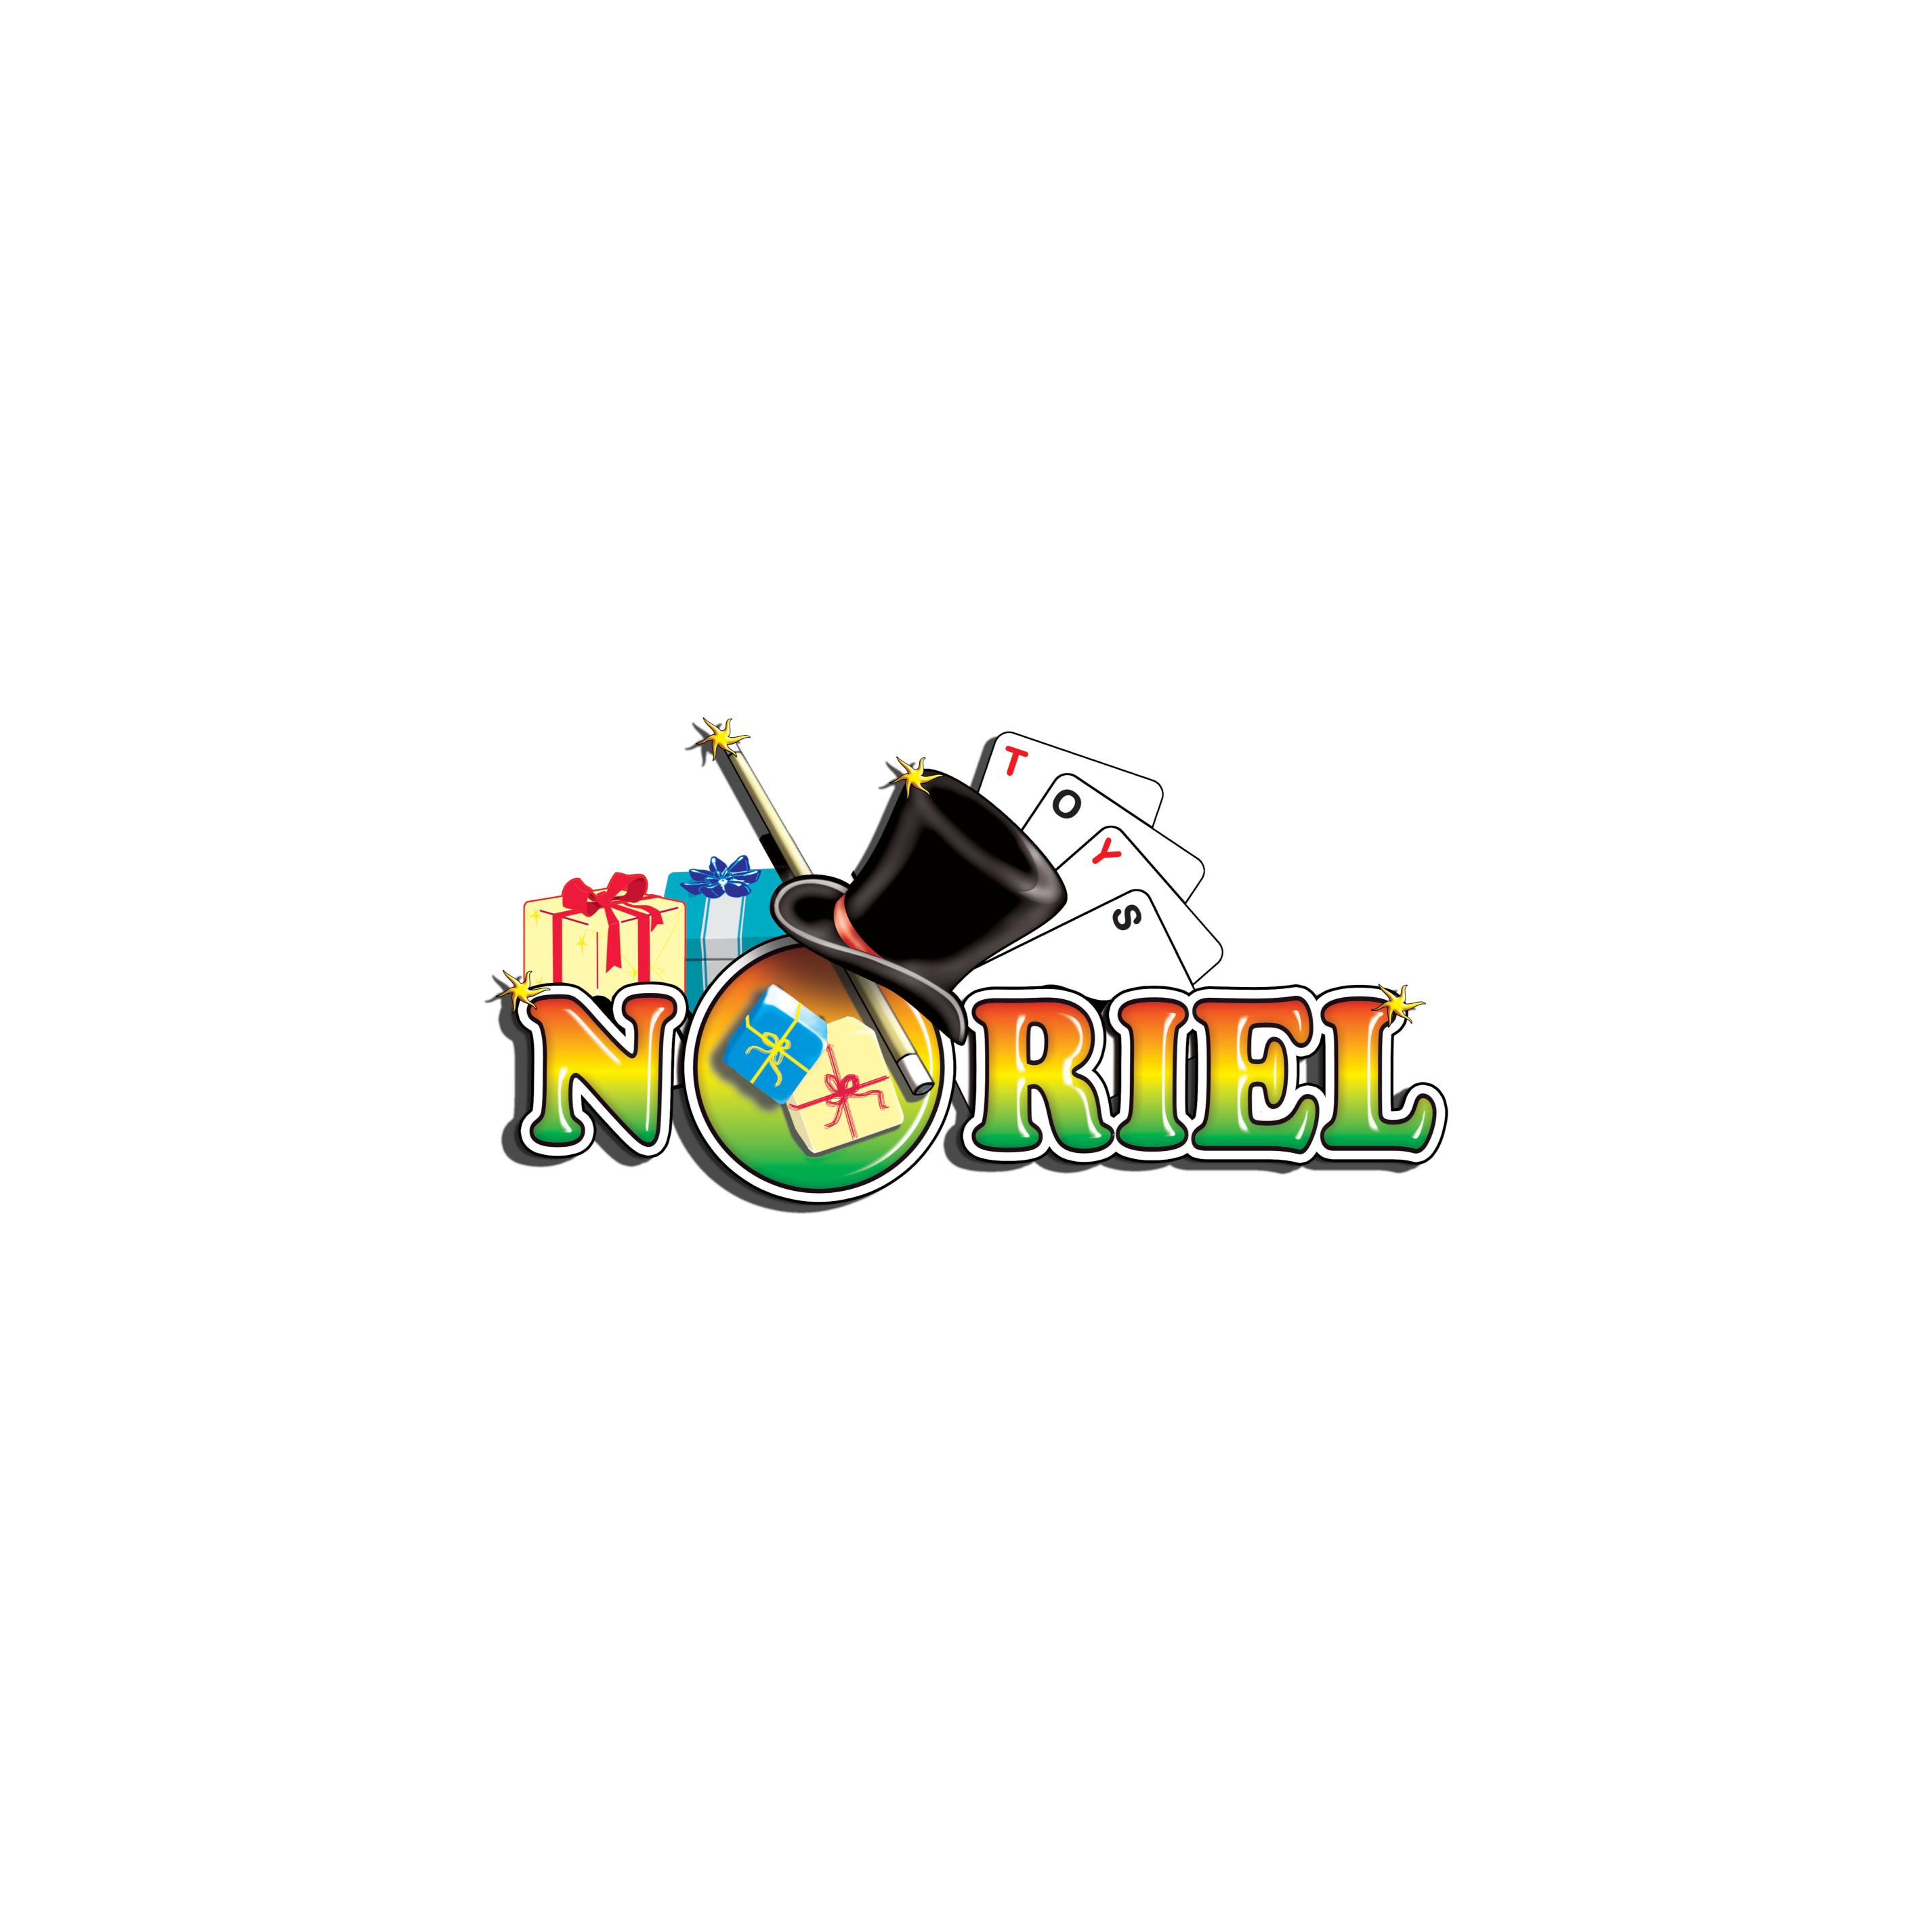 DXV99_2018_006w Set doua masinute Disney Cars 3, Brick Yardley, Cal Weathers, FLH64